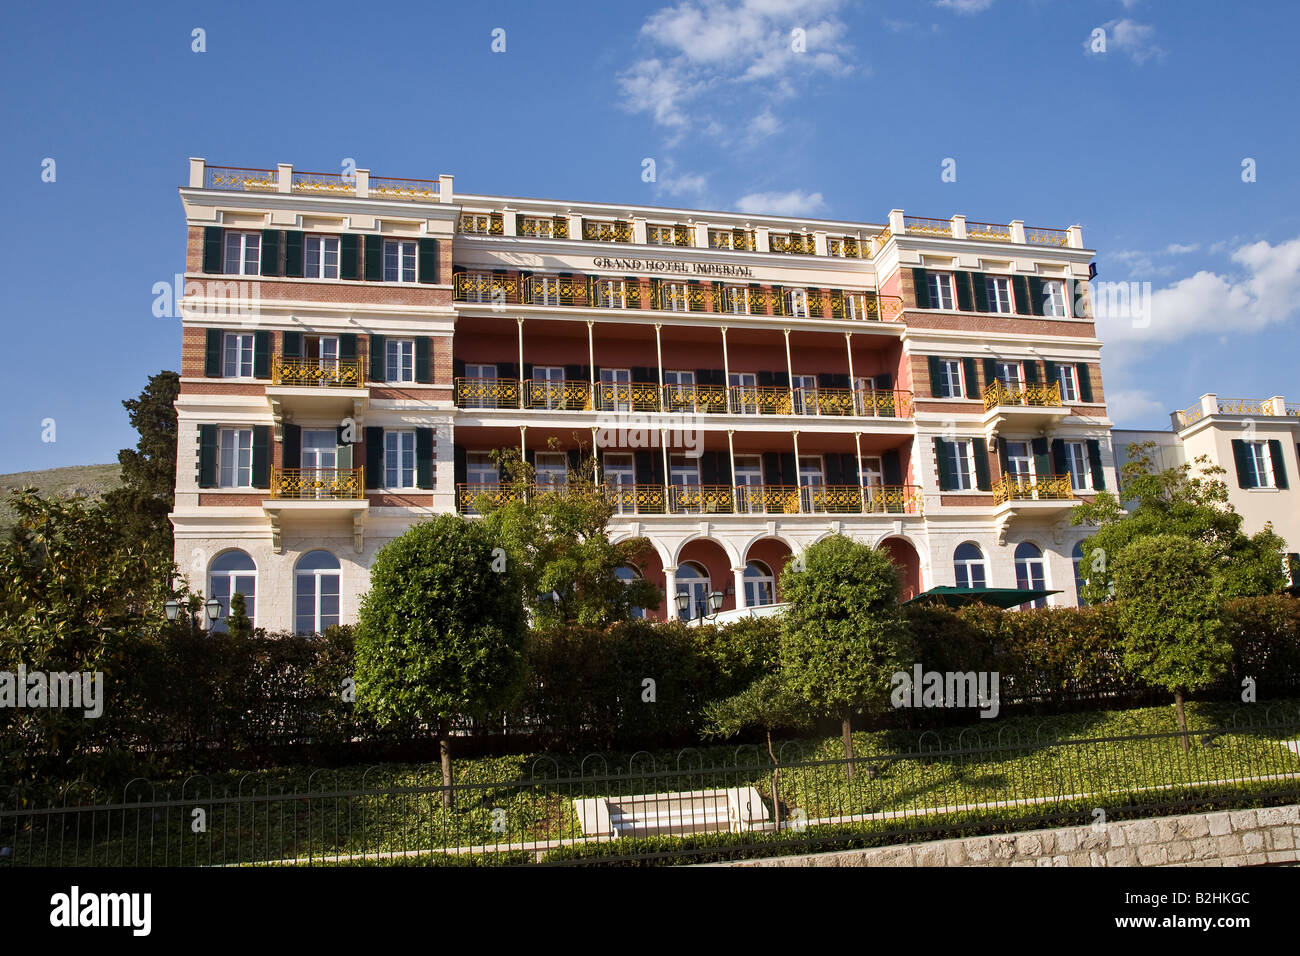 Hotel Imperial Stockfotos Hotel Imperial Bilder Alamy